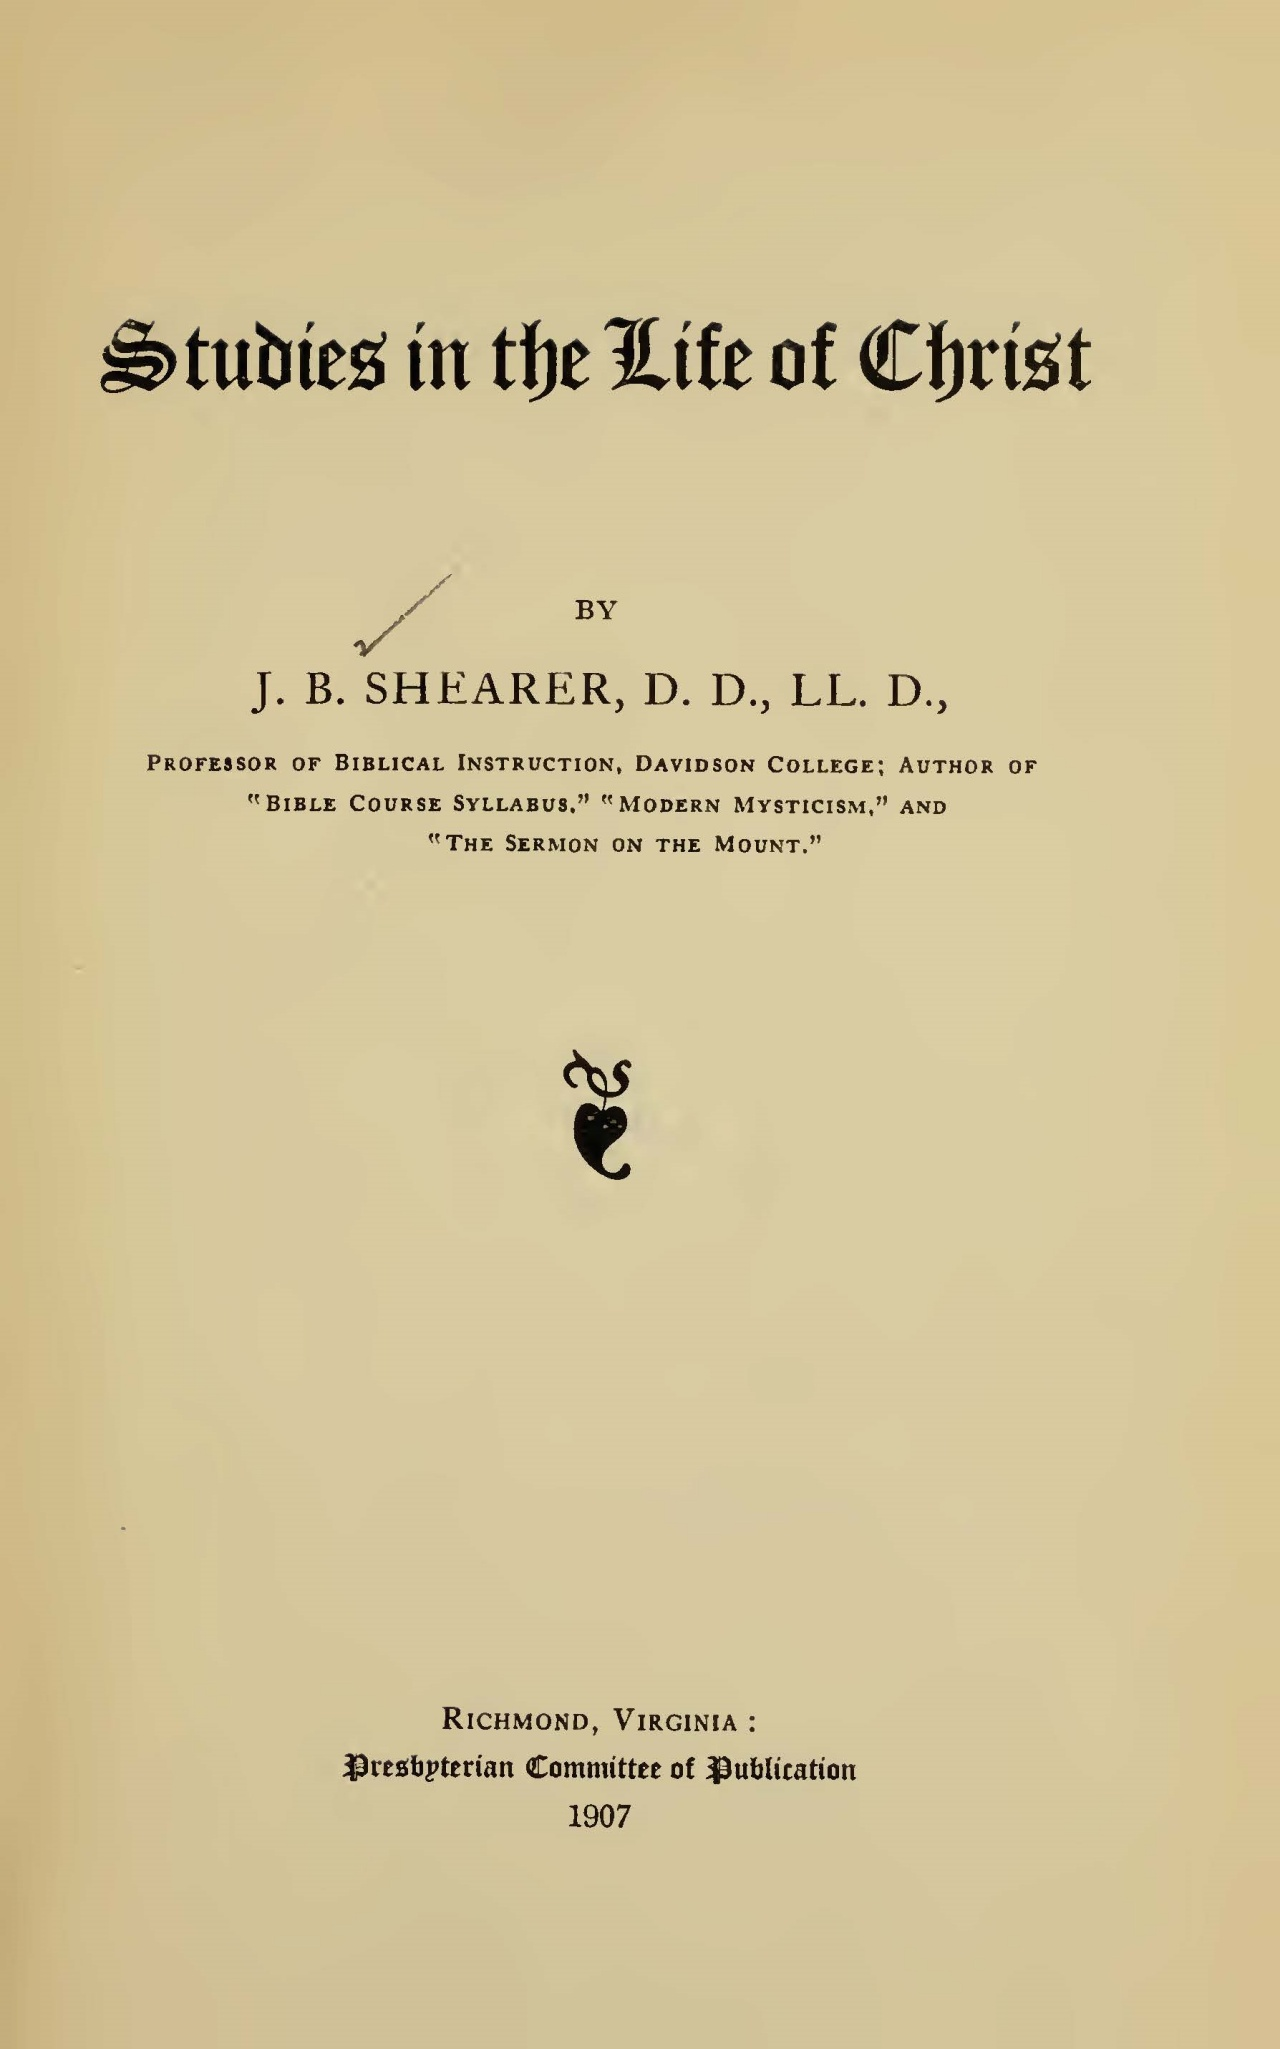 Shearer, John Bunyan, Studies in the Life of Christ Title Page.jpg